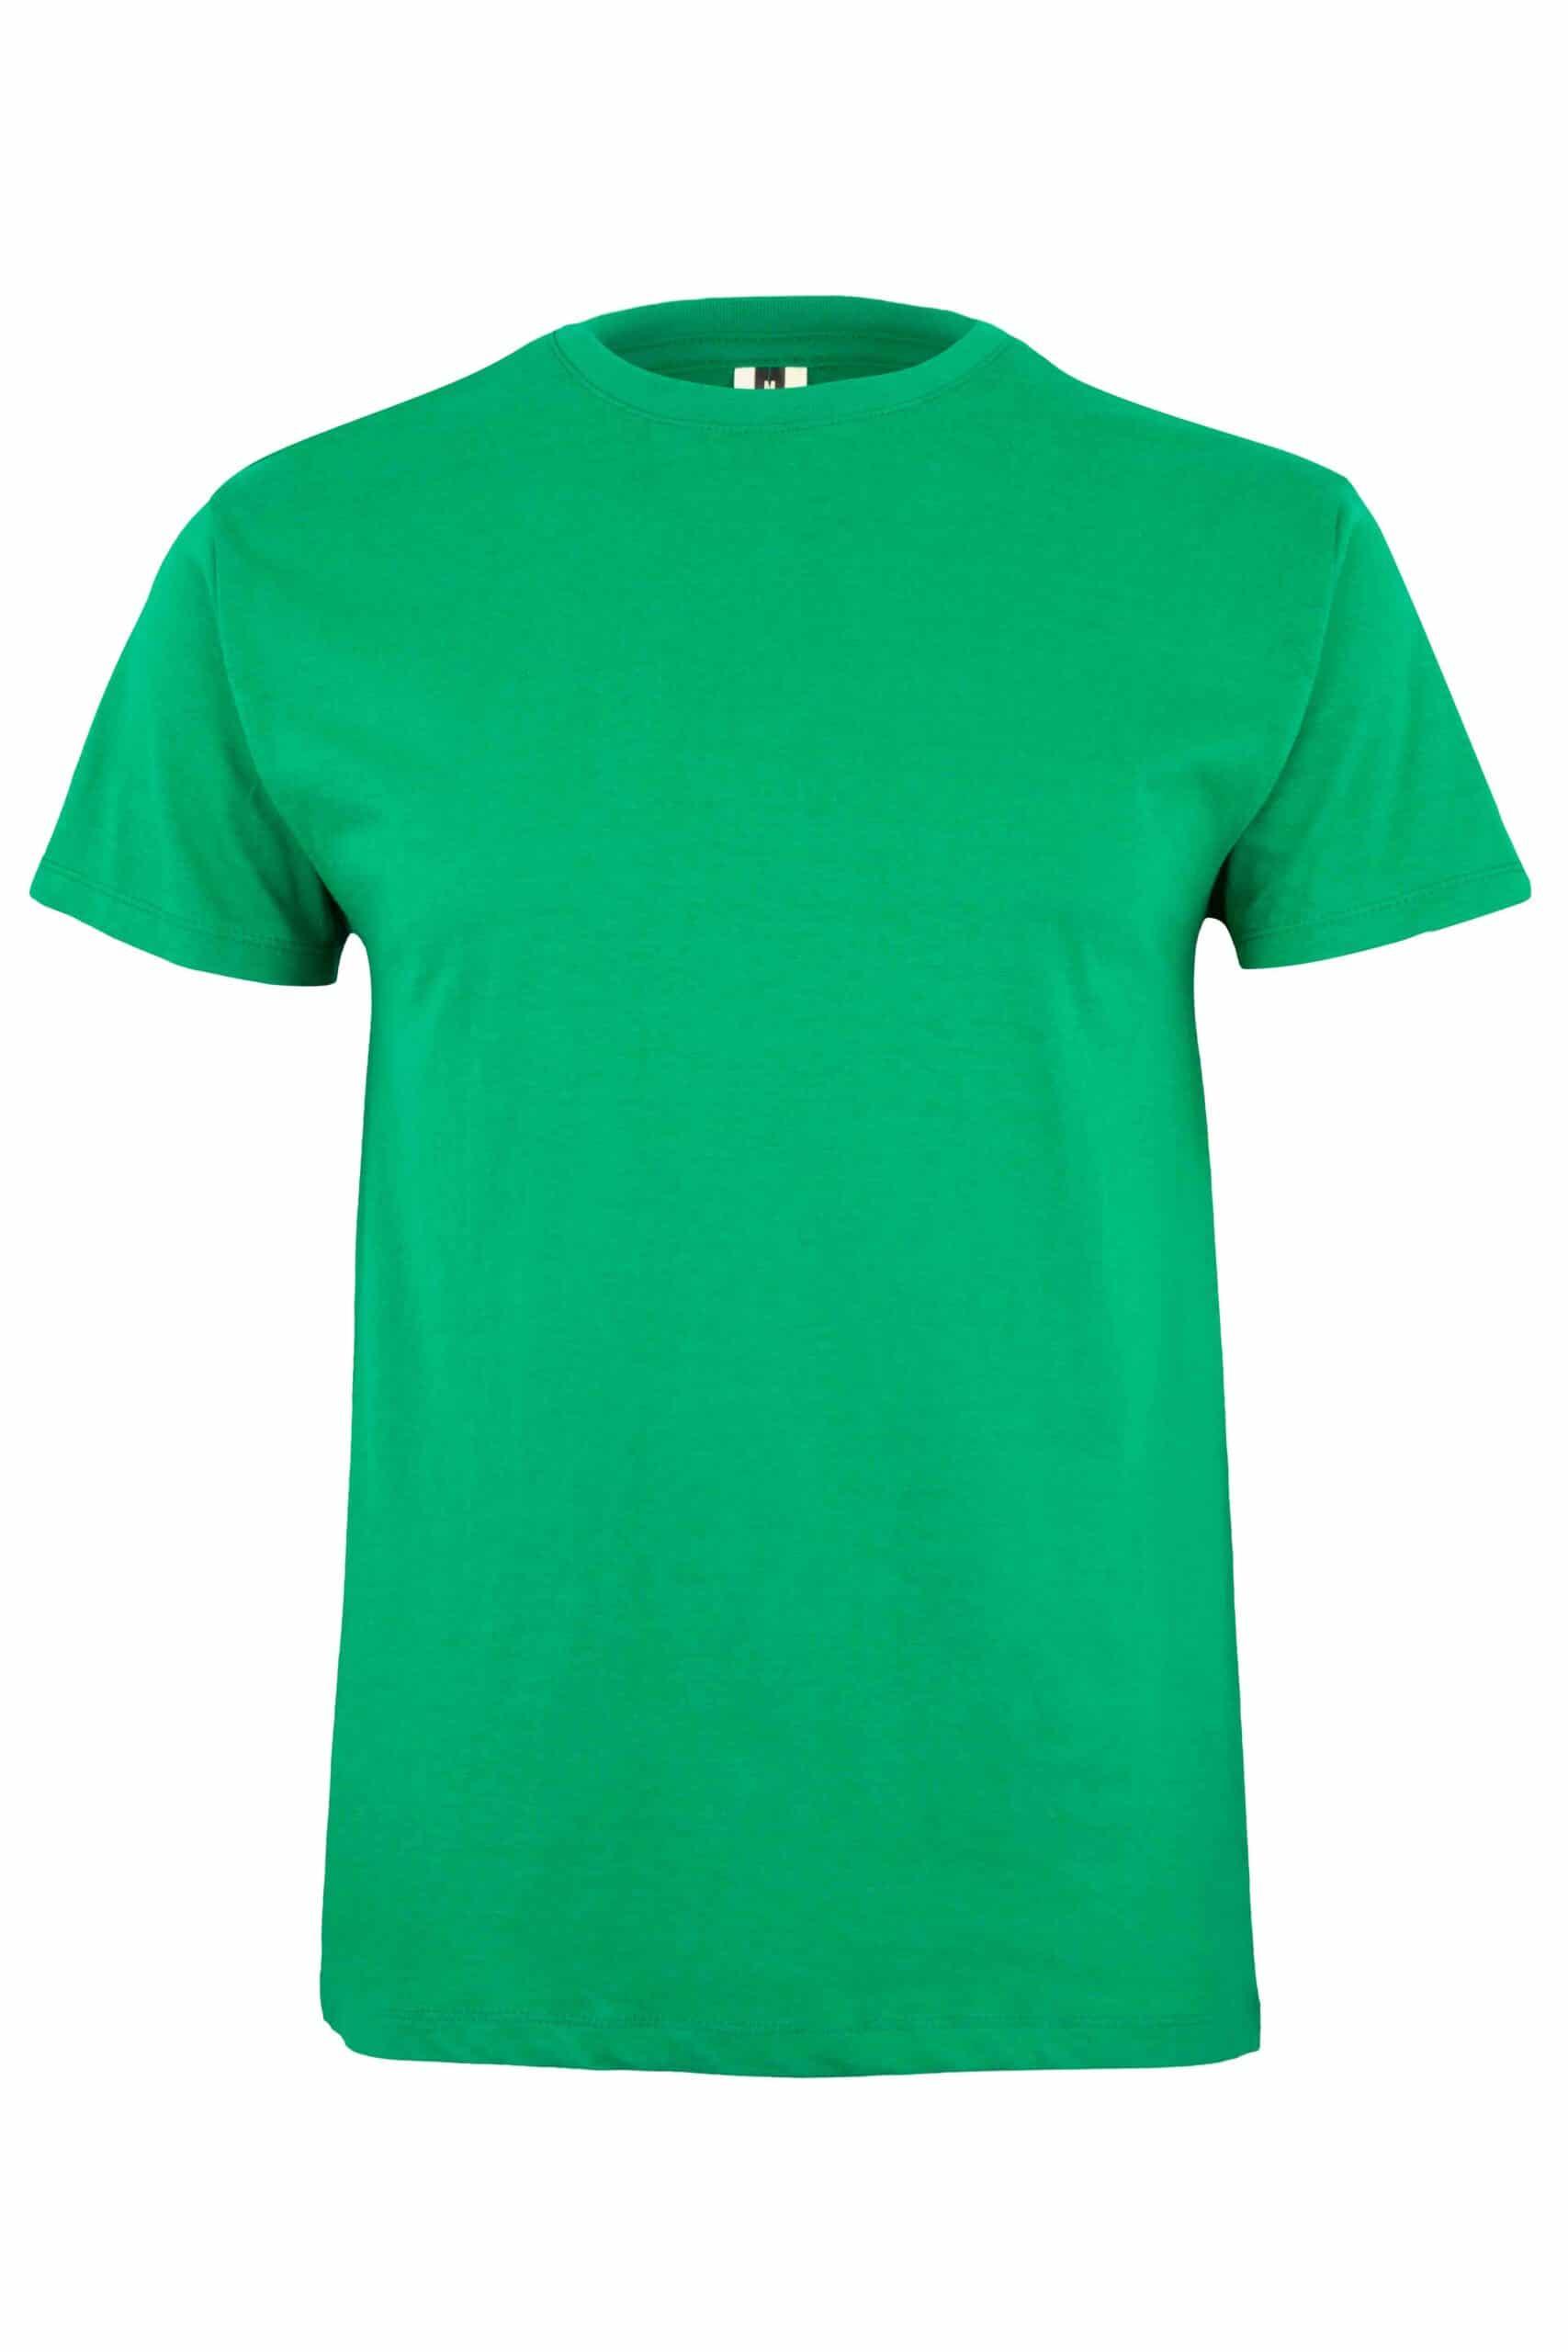 Mukua Mk022cv Camiseta Manga Corta 150gr Kelly Green